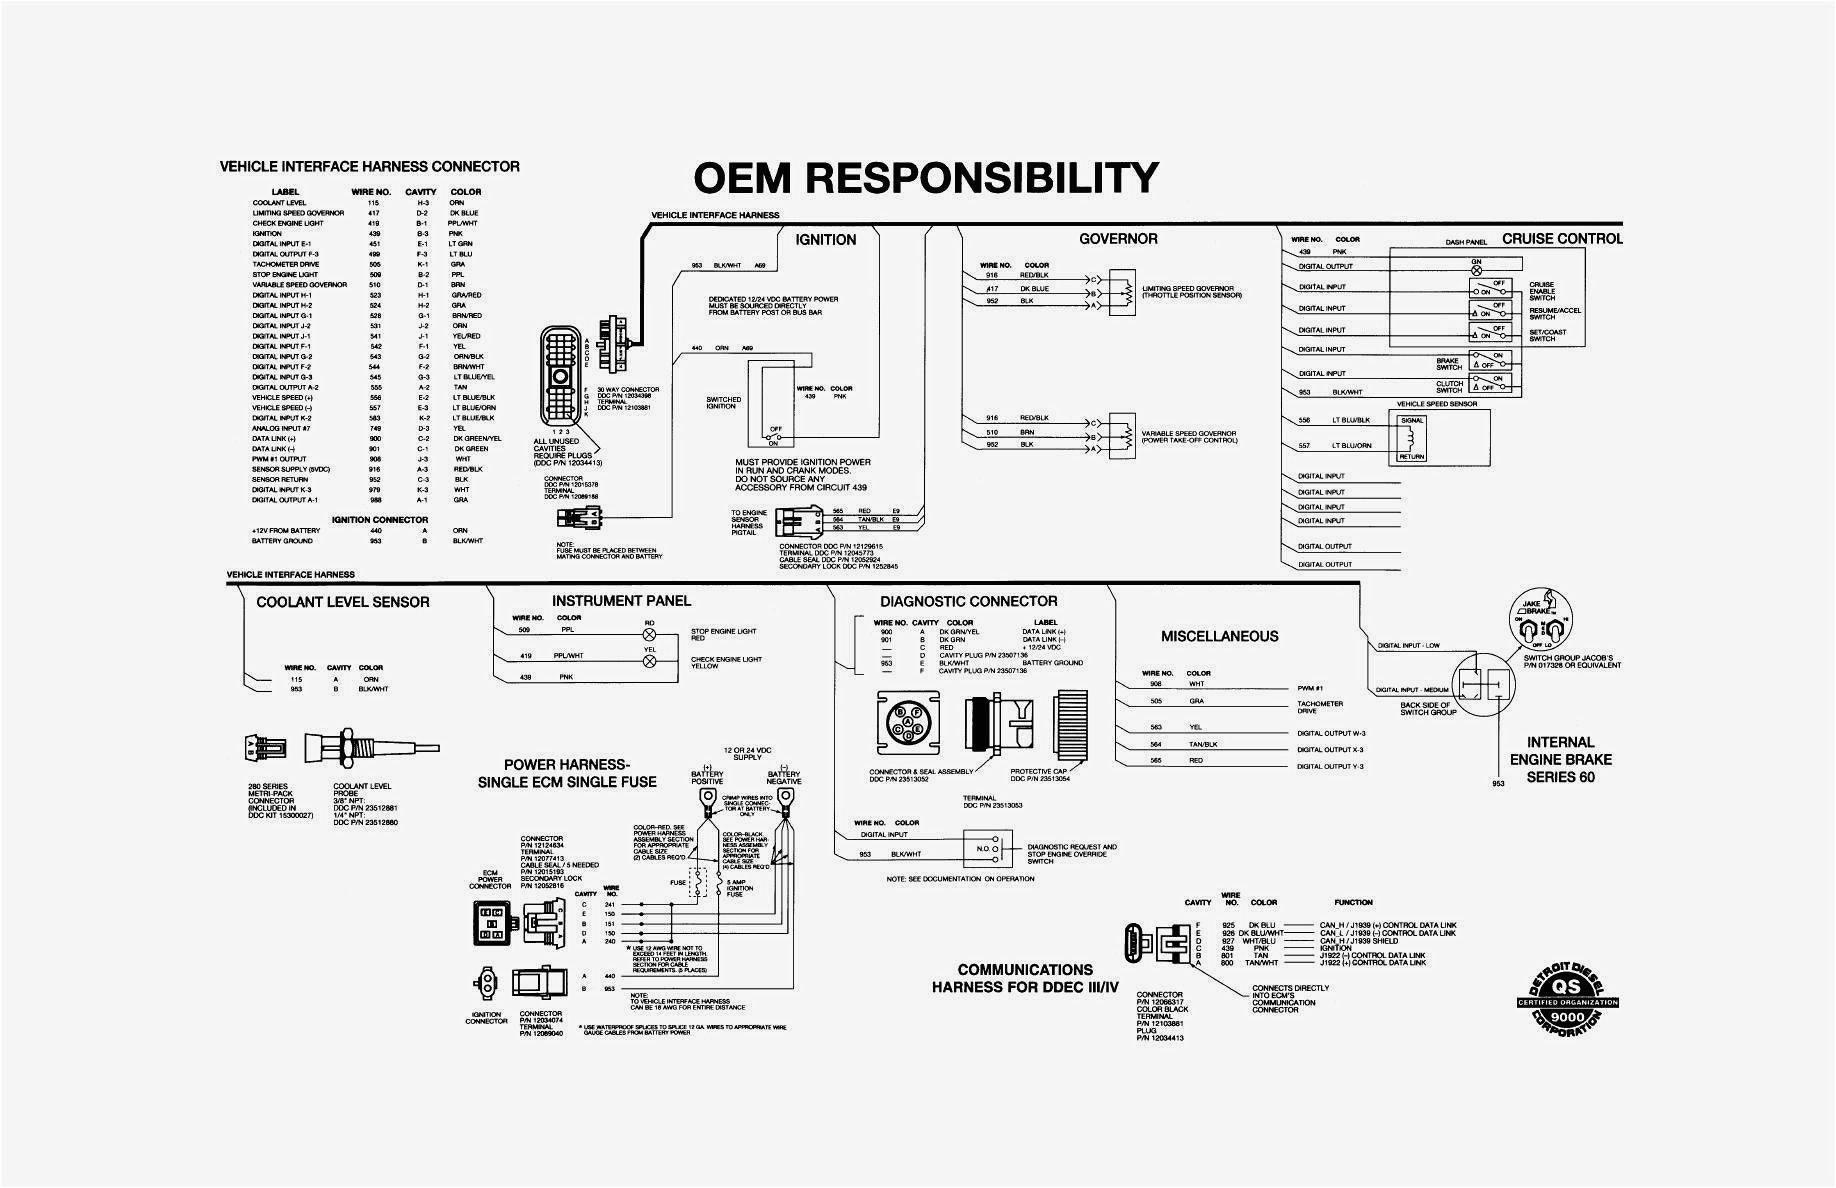 gmos 04 wiring diagram wiring diagram mega gmos lan 04 wiring diagram gmos 04 wiring diagram